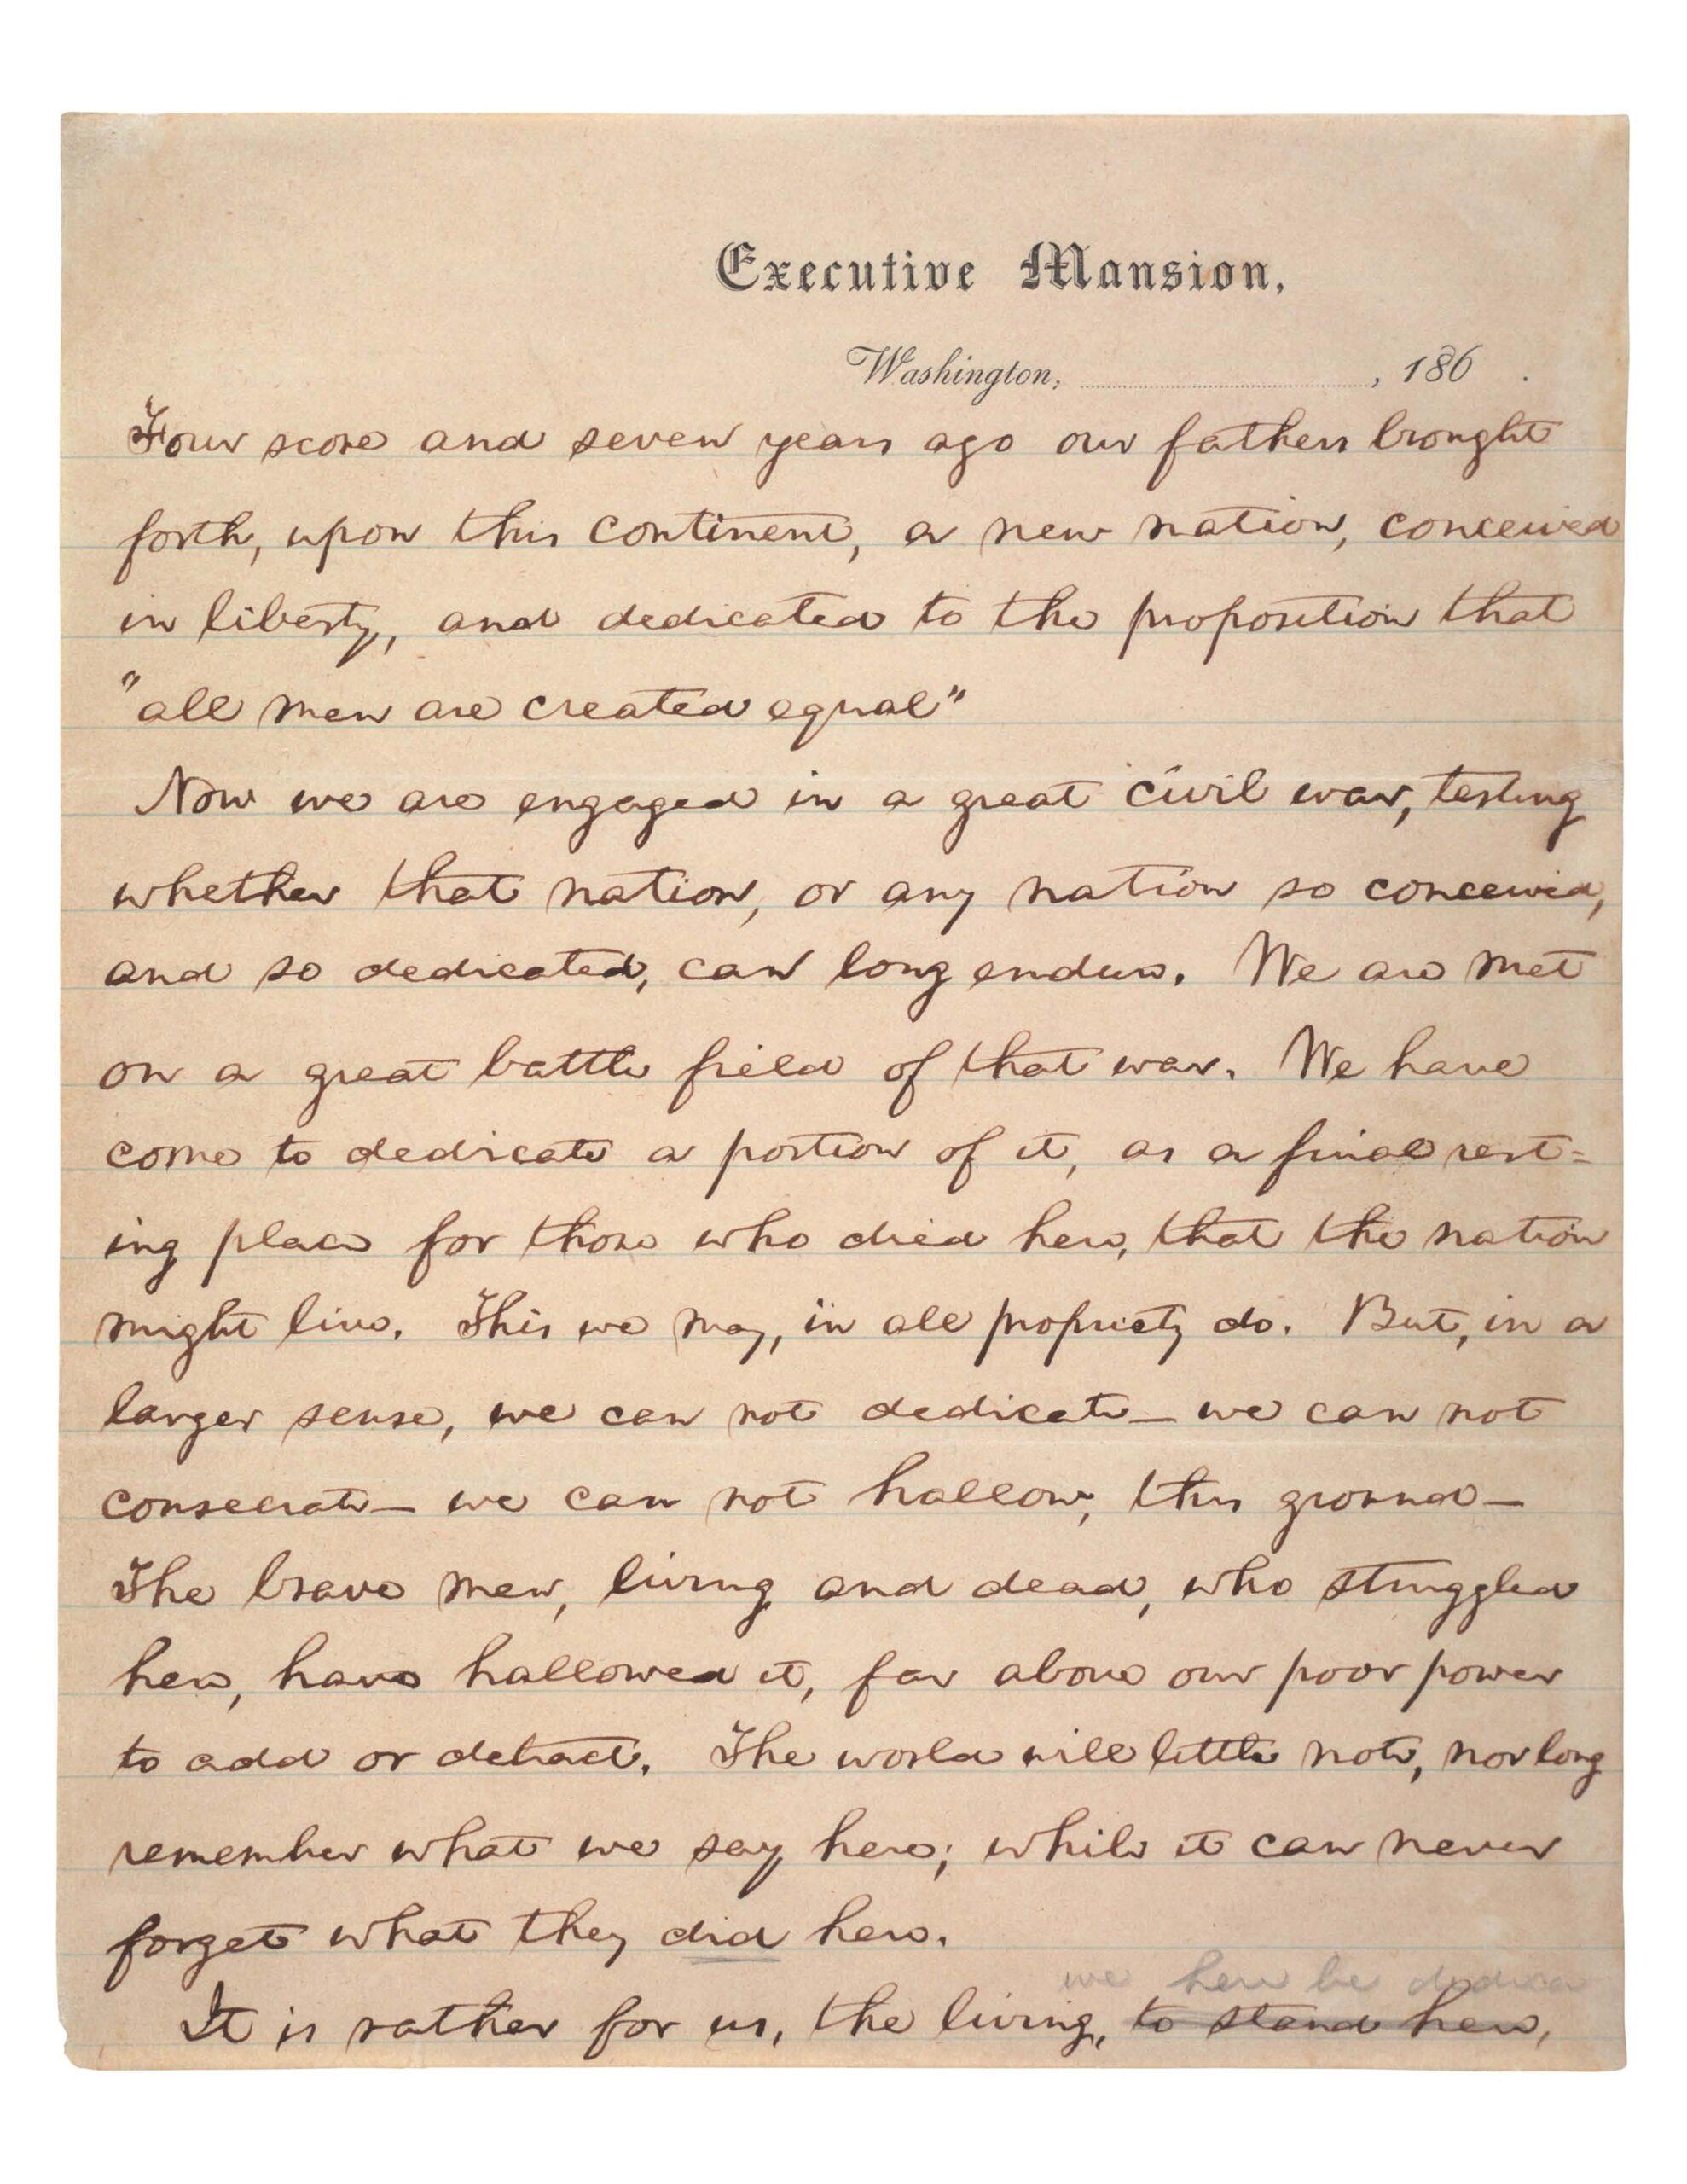 imaeg of the Gettysburg Address